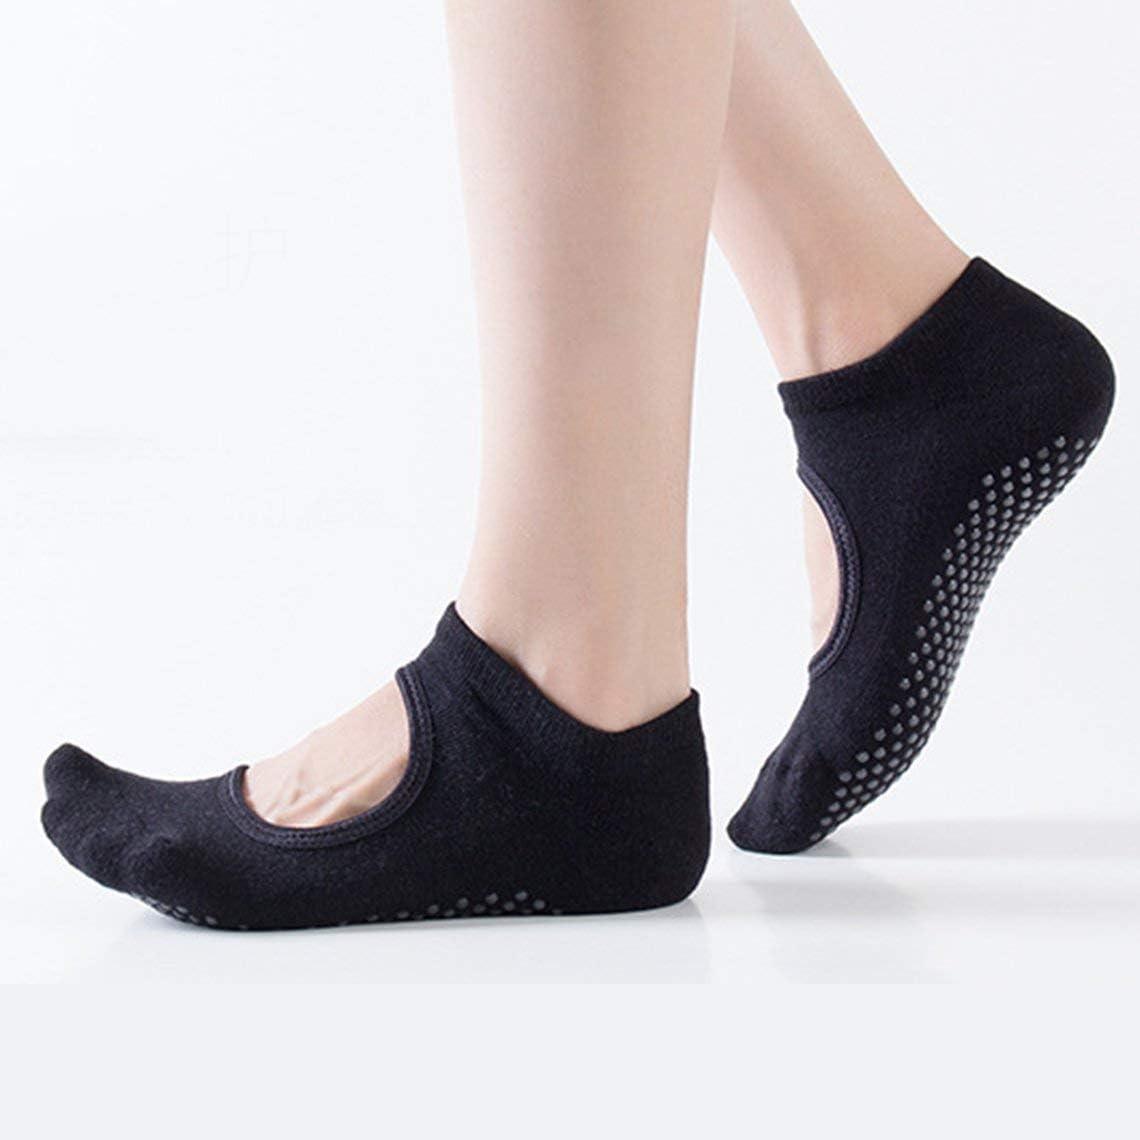 rutschfeste Baumwoll-Socken mit Socken Tanzen atmungsaktiv Yoga Gymnastik f/ür Fitness rutschfest Absatz Damen Pilates Zinniaya Anti-Rutsch-Socken f/ür Herren